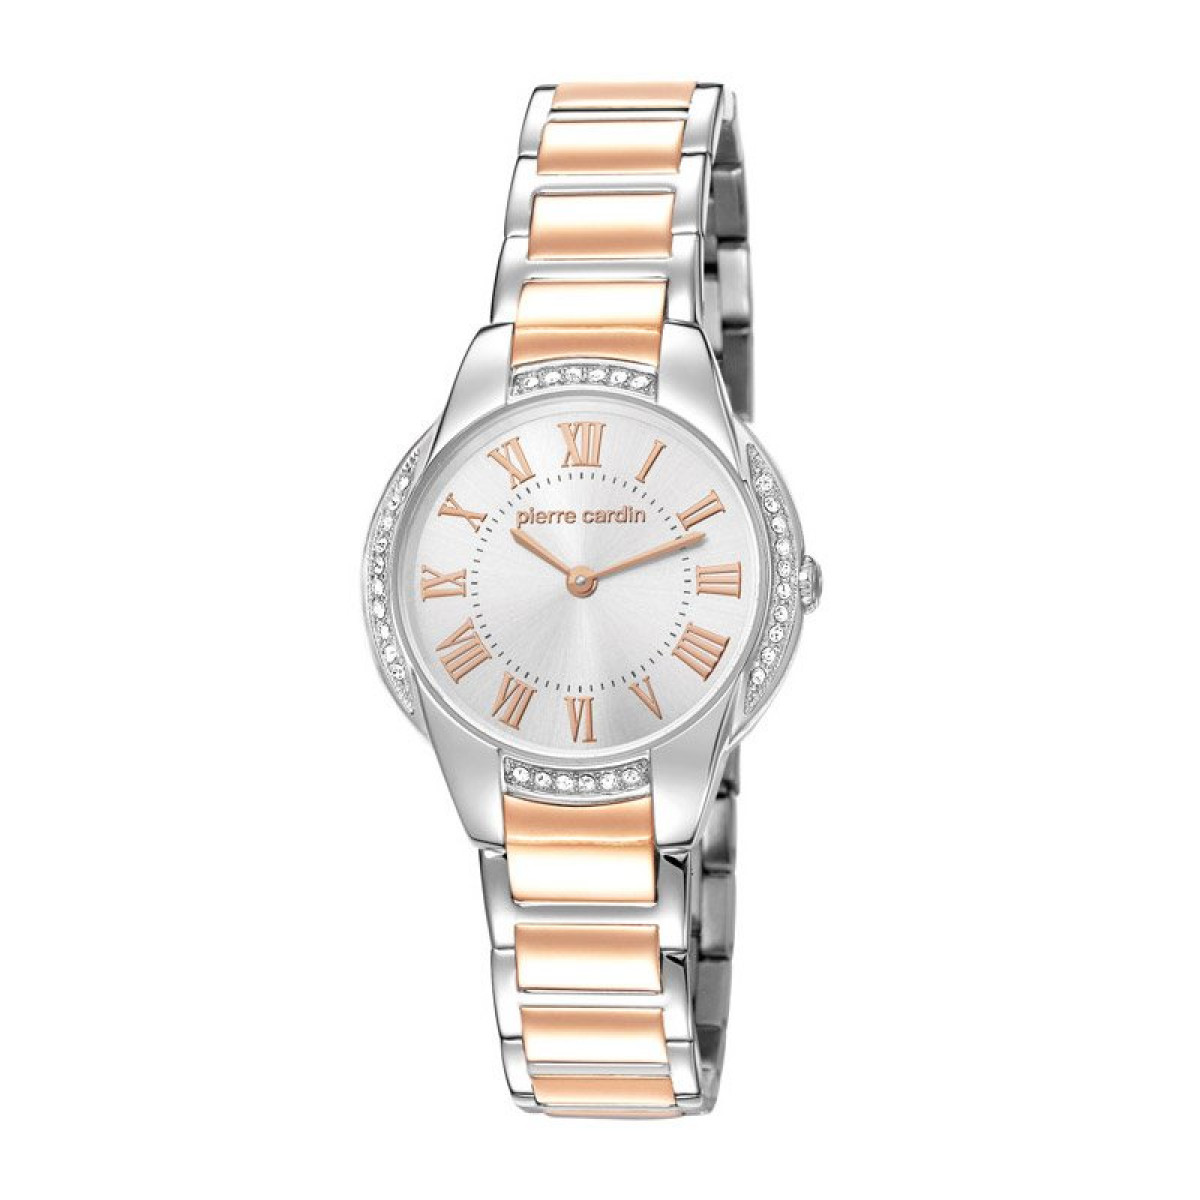 Часовник Pierre Cardin PC106882F06